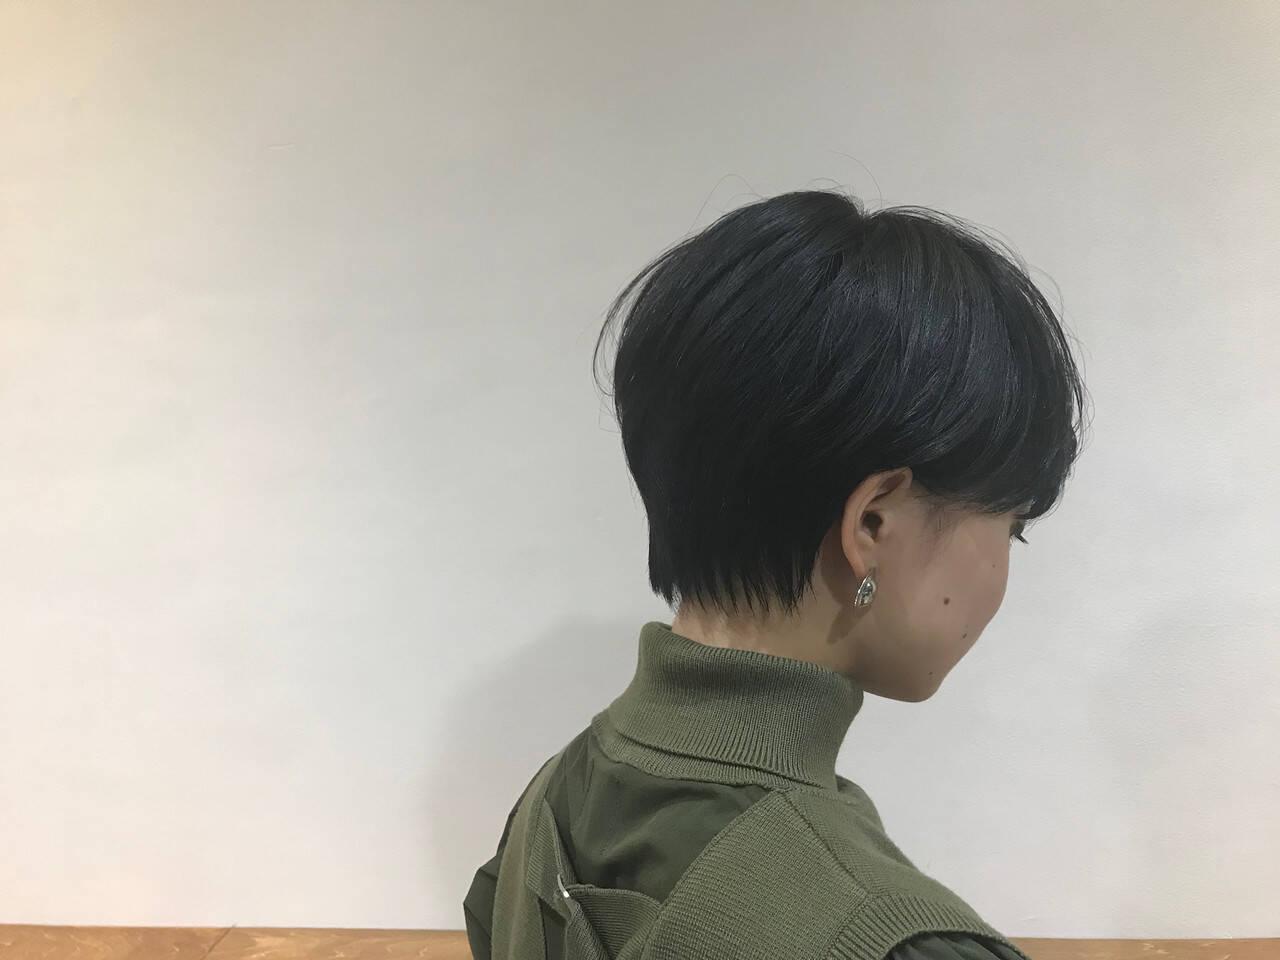 N.オイル 黒髪ショート ショート モードヘアスタイルや髪型の写真・画像